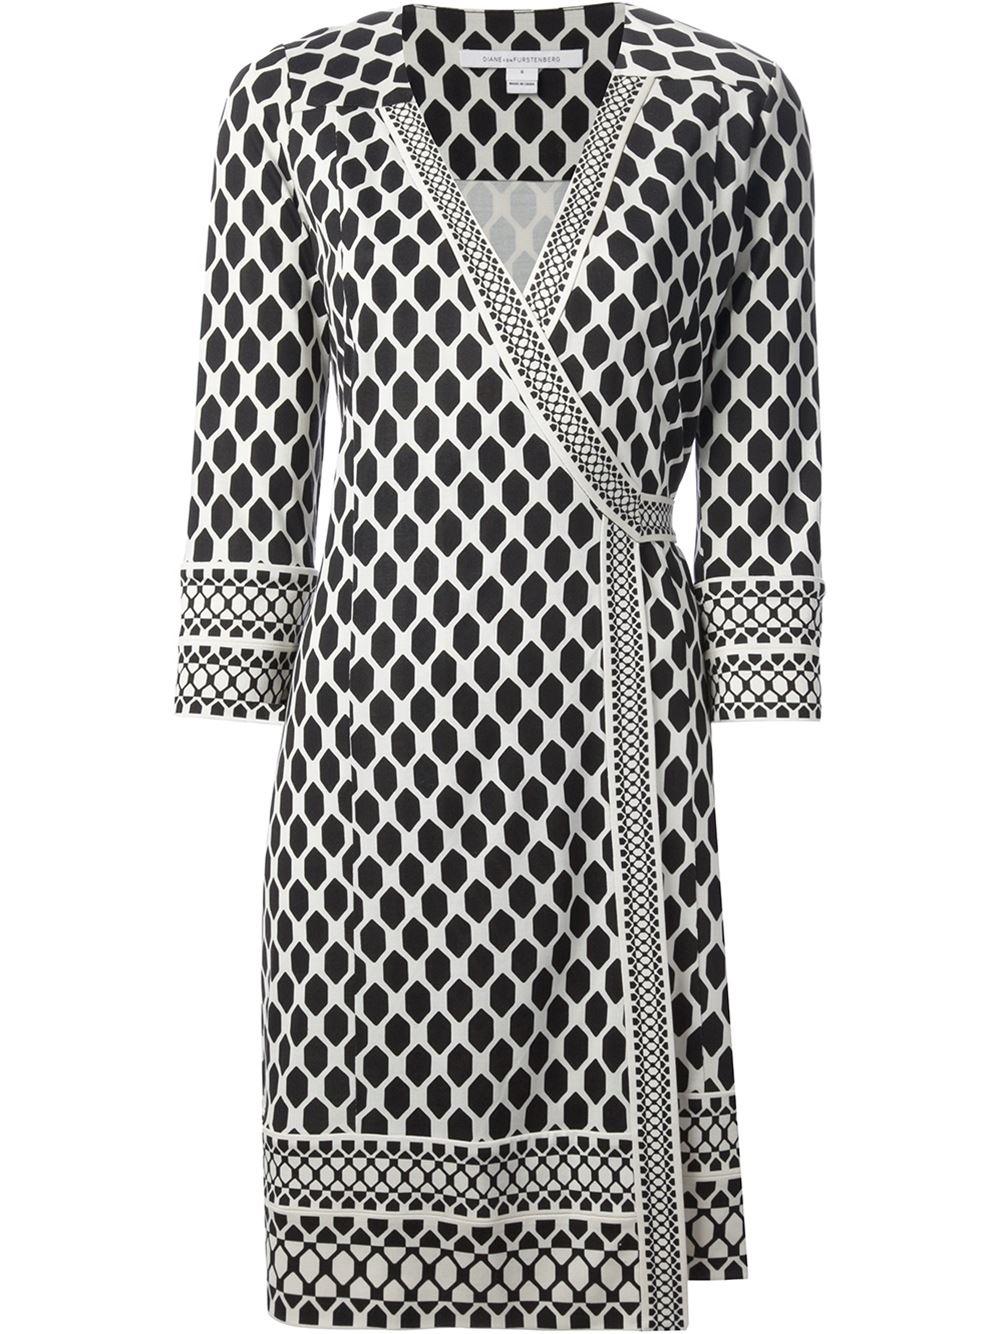 Diane Von Furstenberg 'tullulah' Dress - Mohge & Maude - Farfetch.com